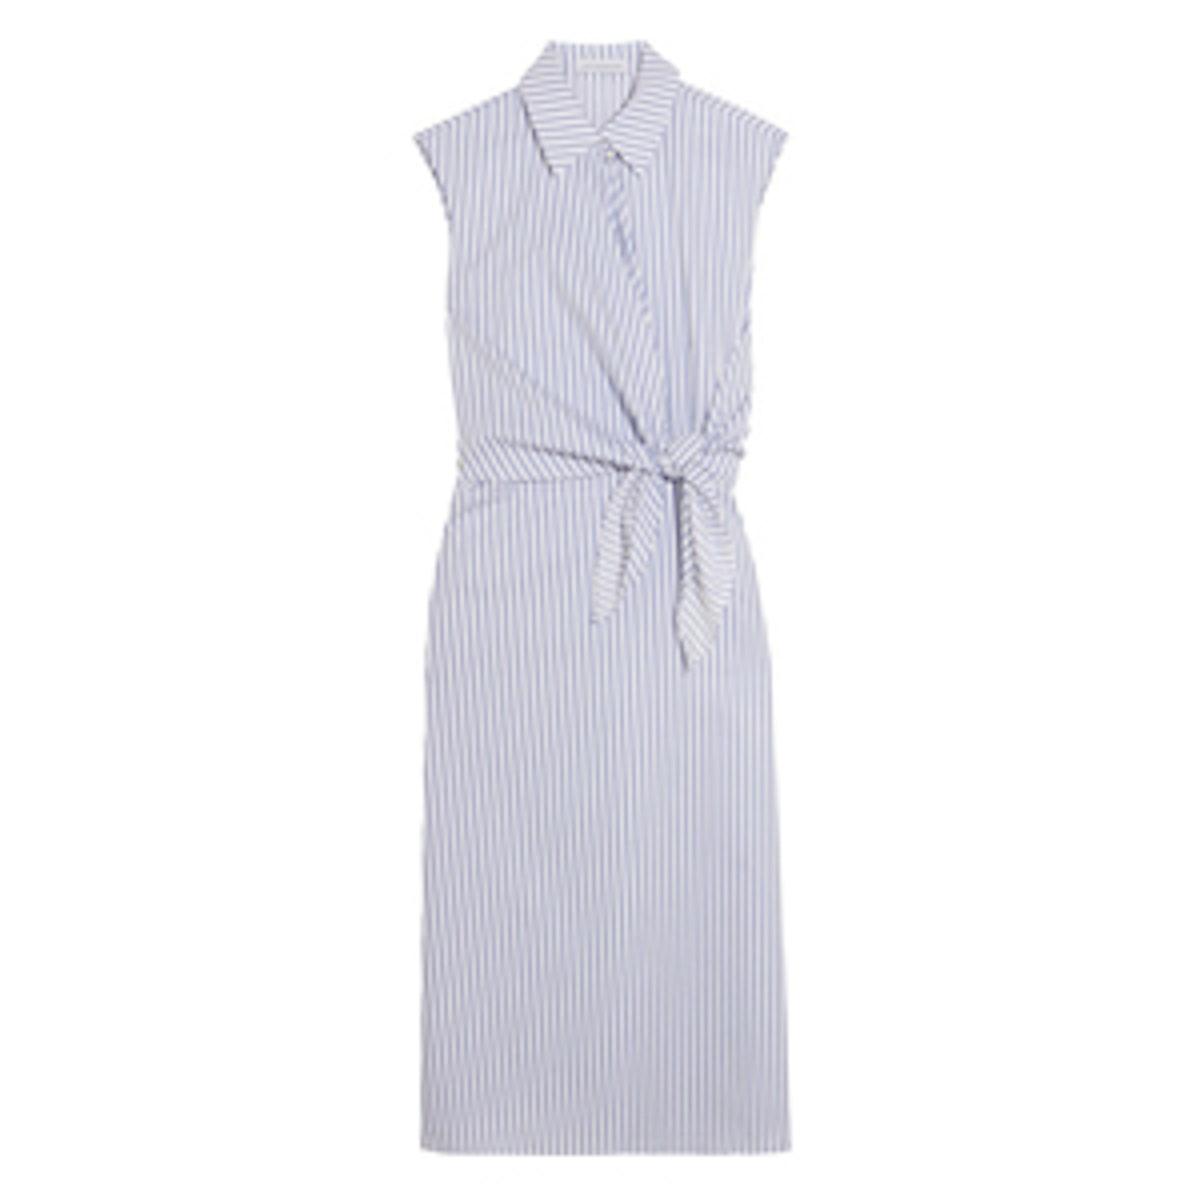 Knotted Striped Cotton Shirt Dress